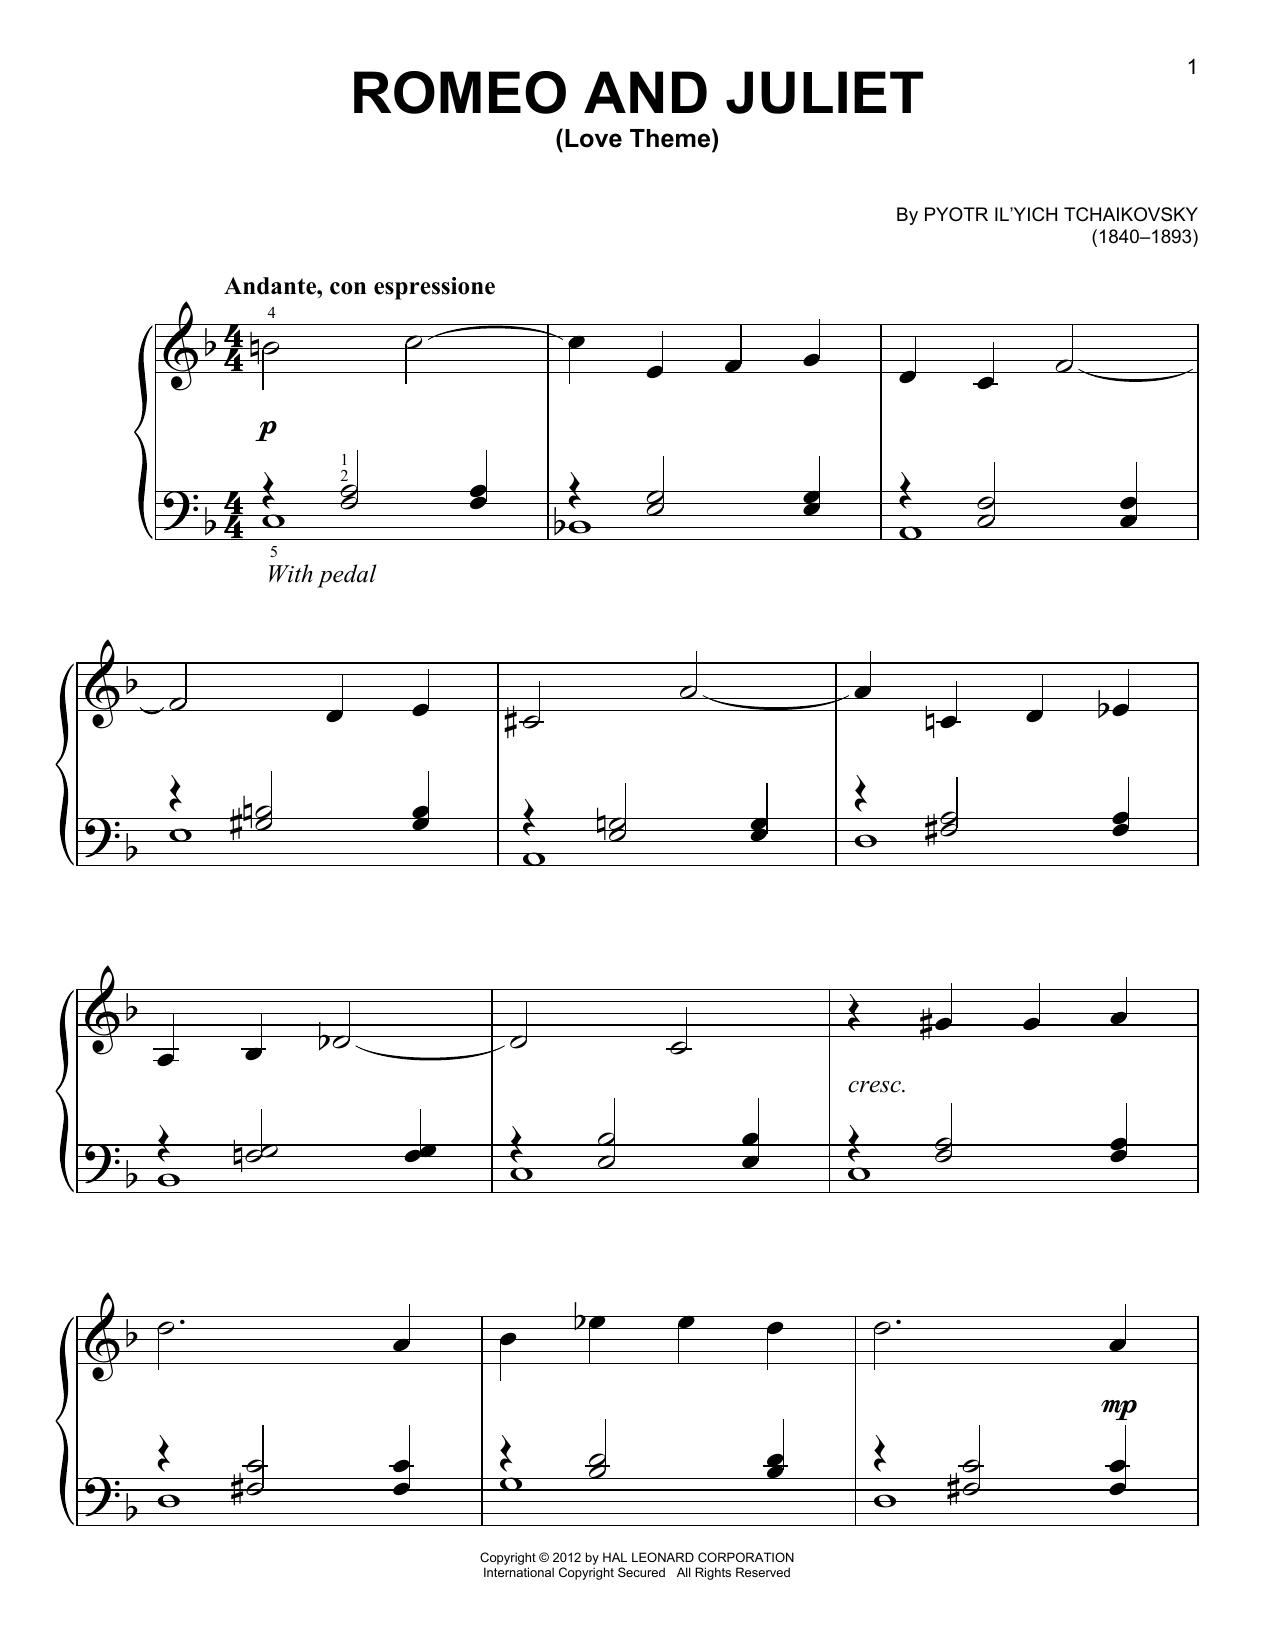 Romeo And Juliet (Love Theme) Sheet Music